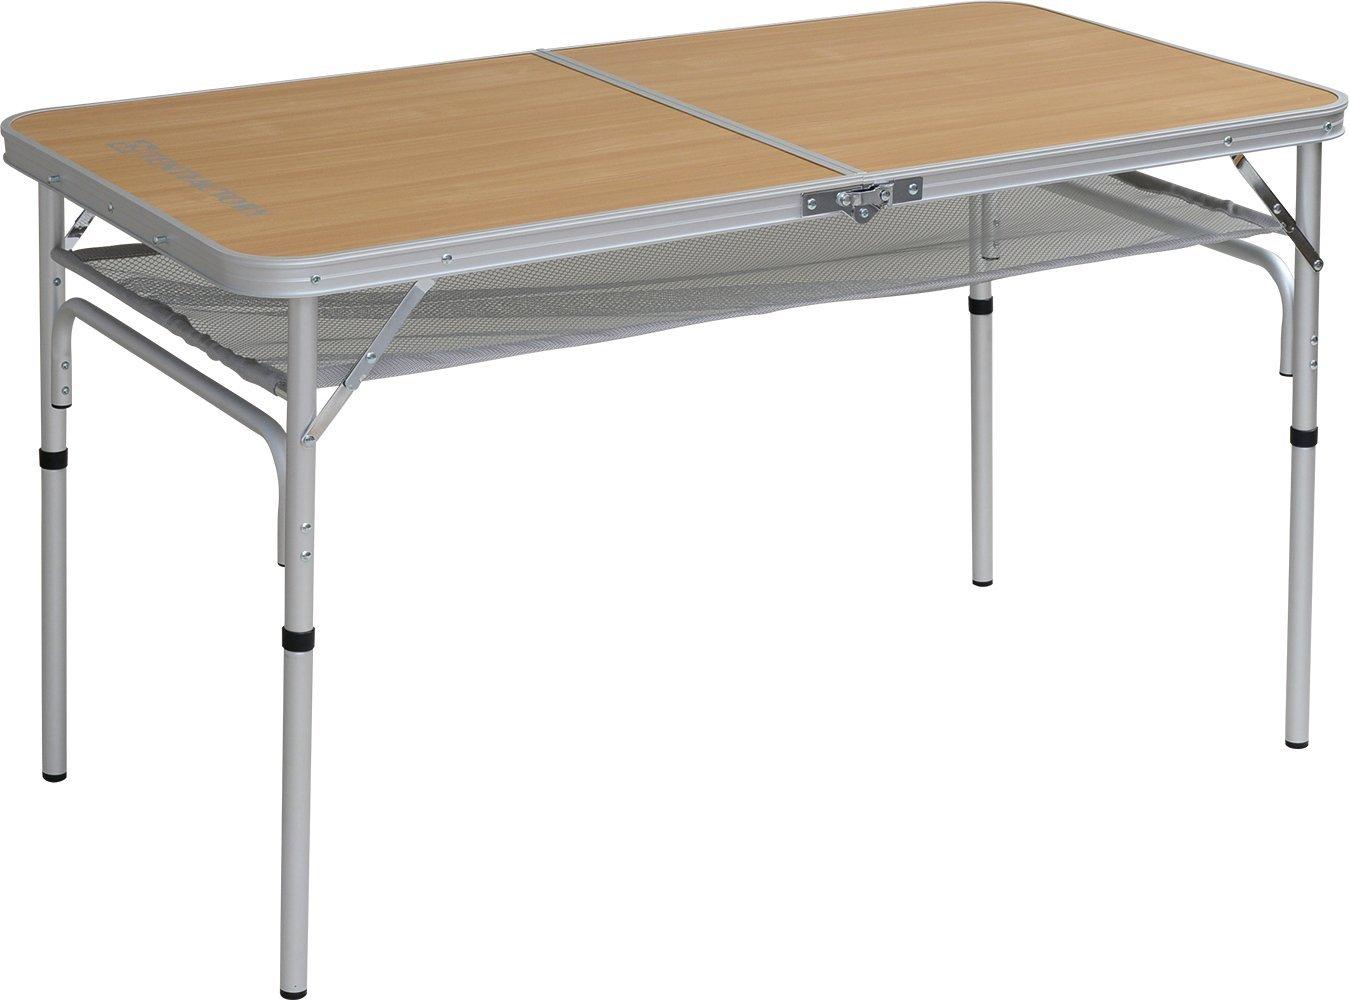 TENT FACTORY (tent factory) dual folding table 1260EX Natural 120 ~ 60 ~ 68 (35) cm TF-DFT1260EX-NA